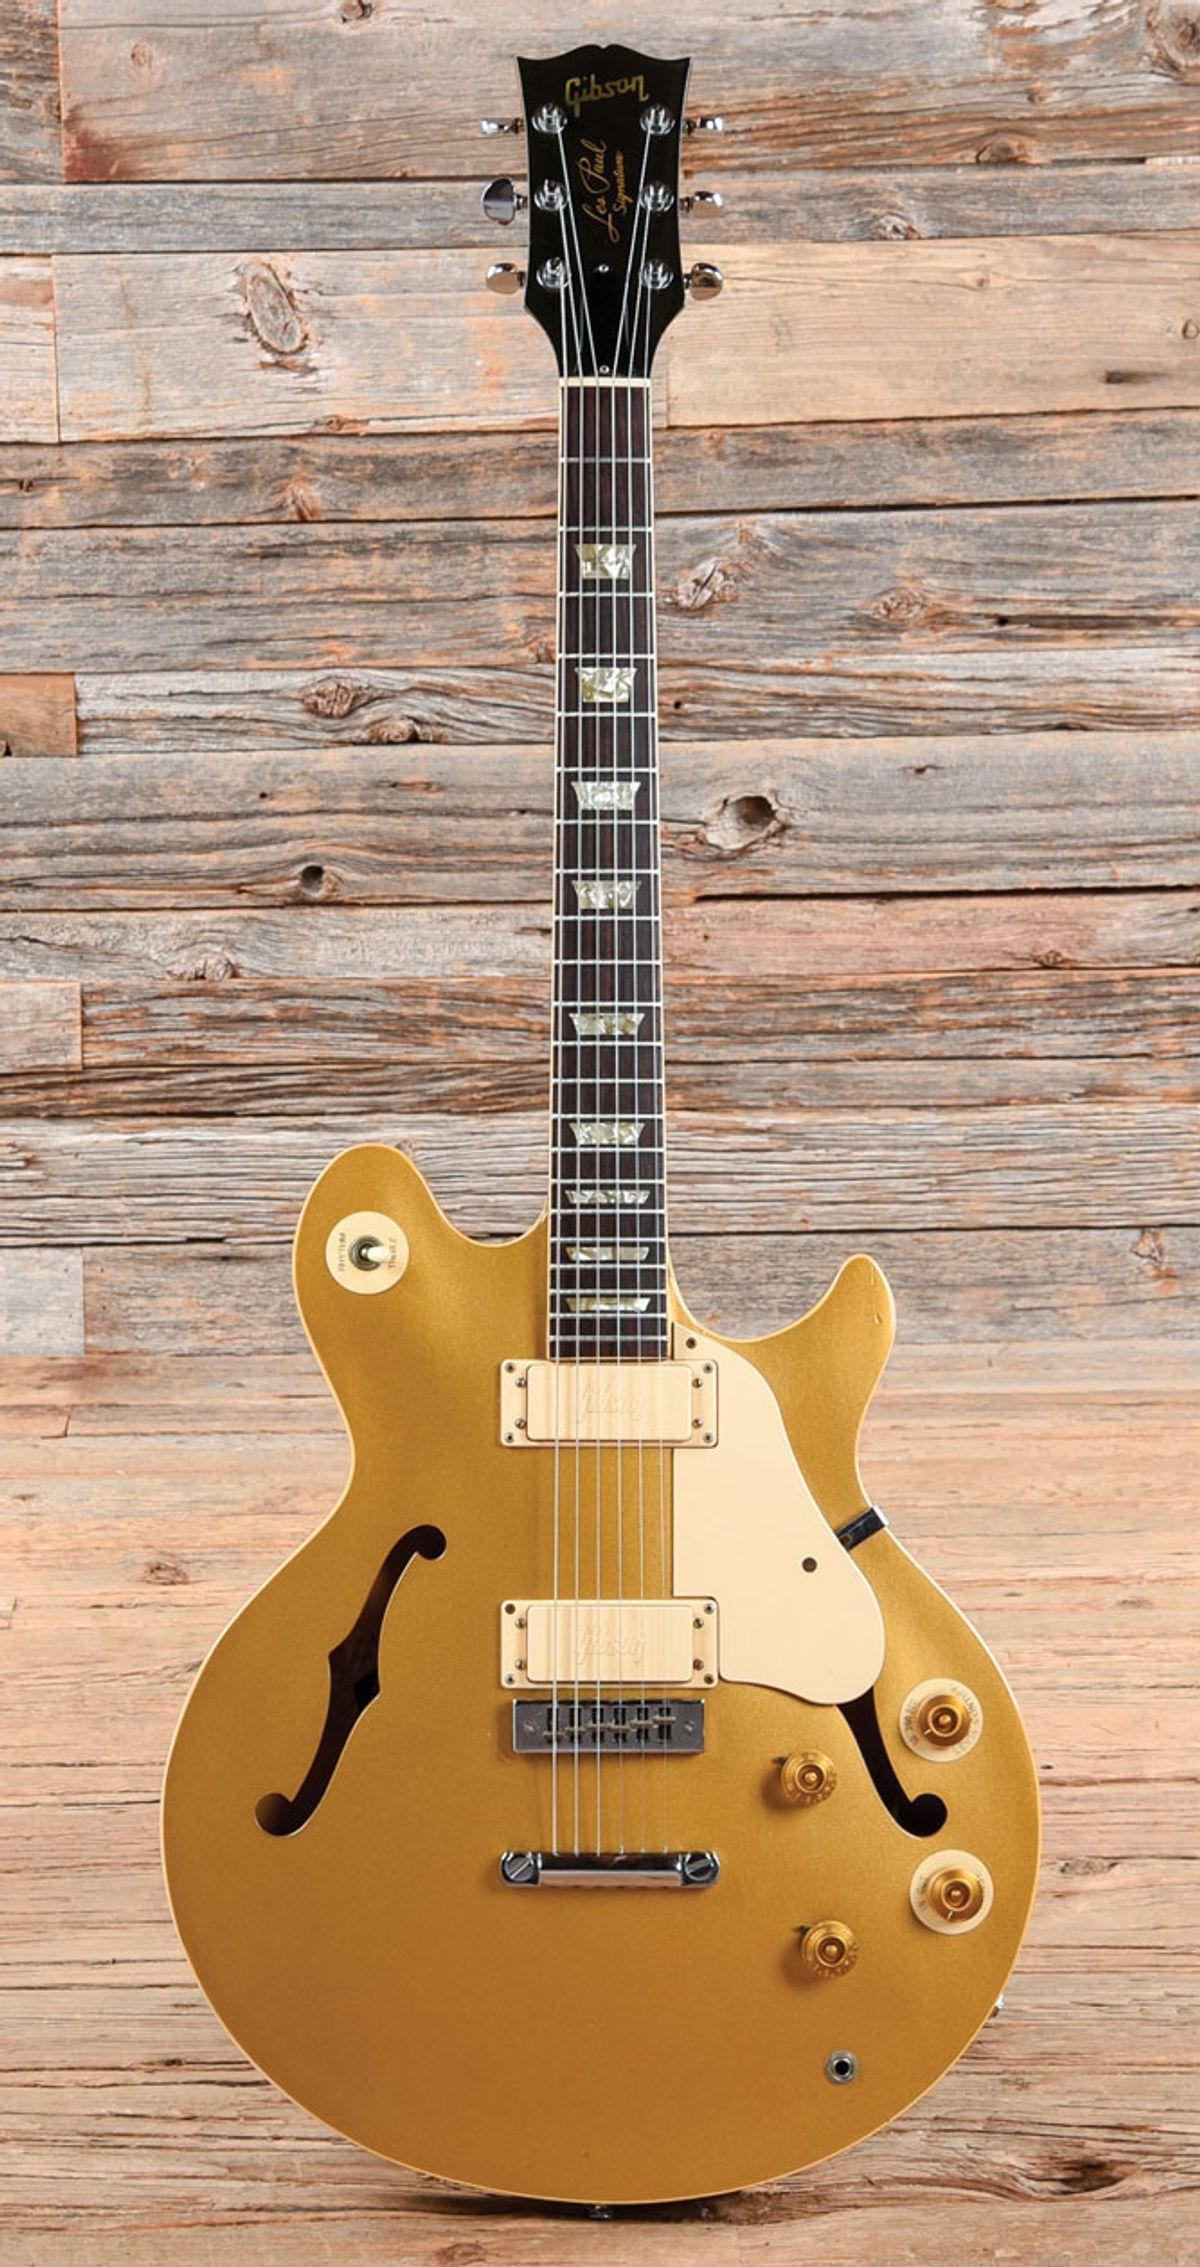 Vintage Vault: Reassessing a Rare Semi-Hollow '73 Les Paul Signature Model